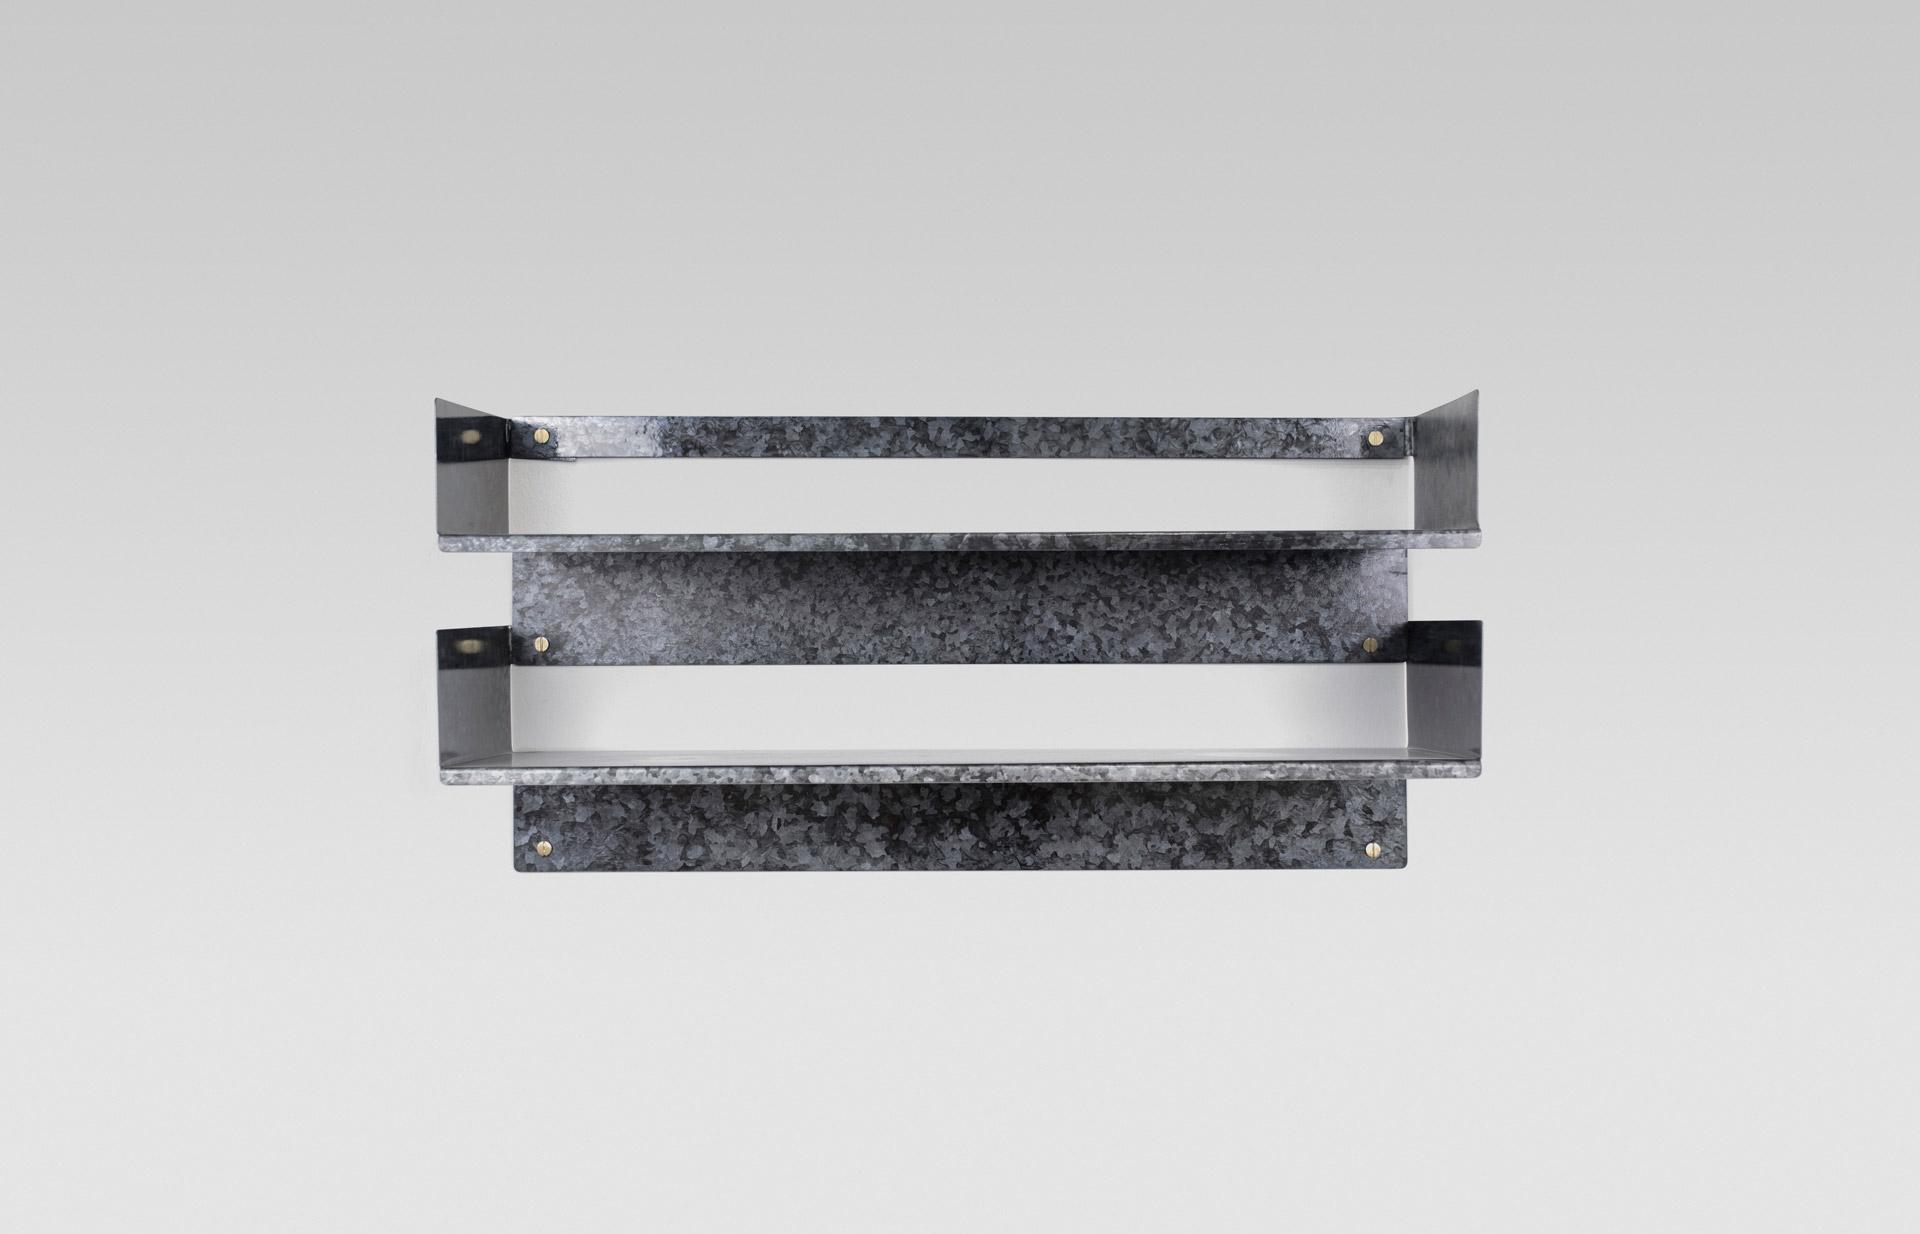 Tino Seubert - Regalvanize - Folded Shelves